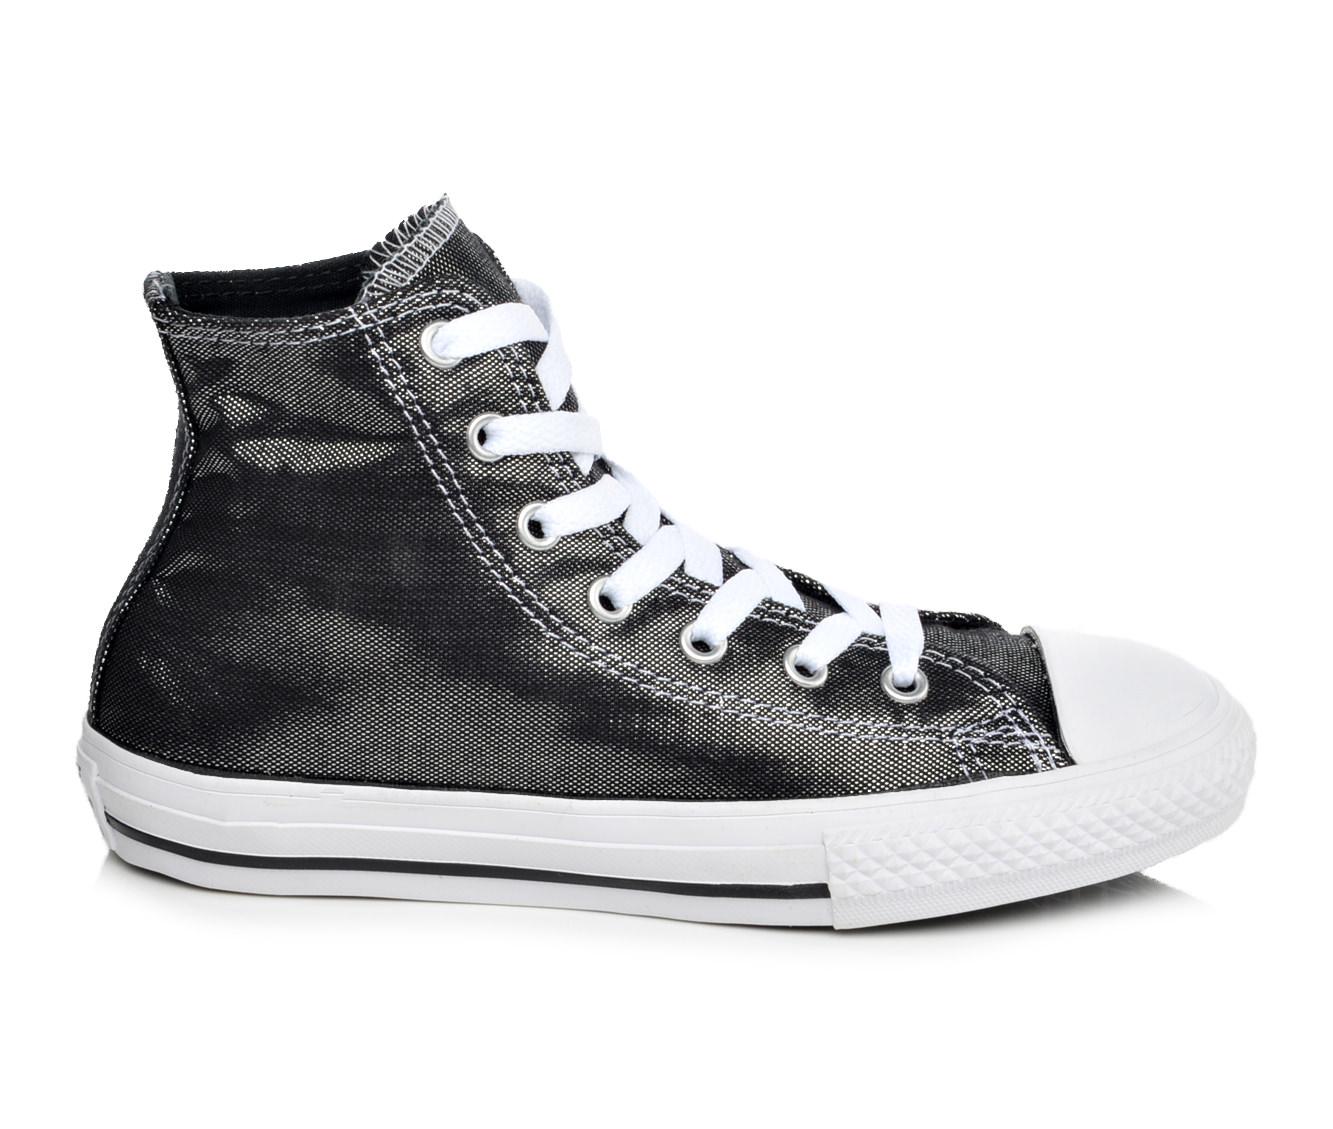 Girls' Converse Chuck Taylor Hi Shimmer Shine Sneakers (Black)